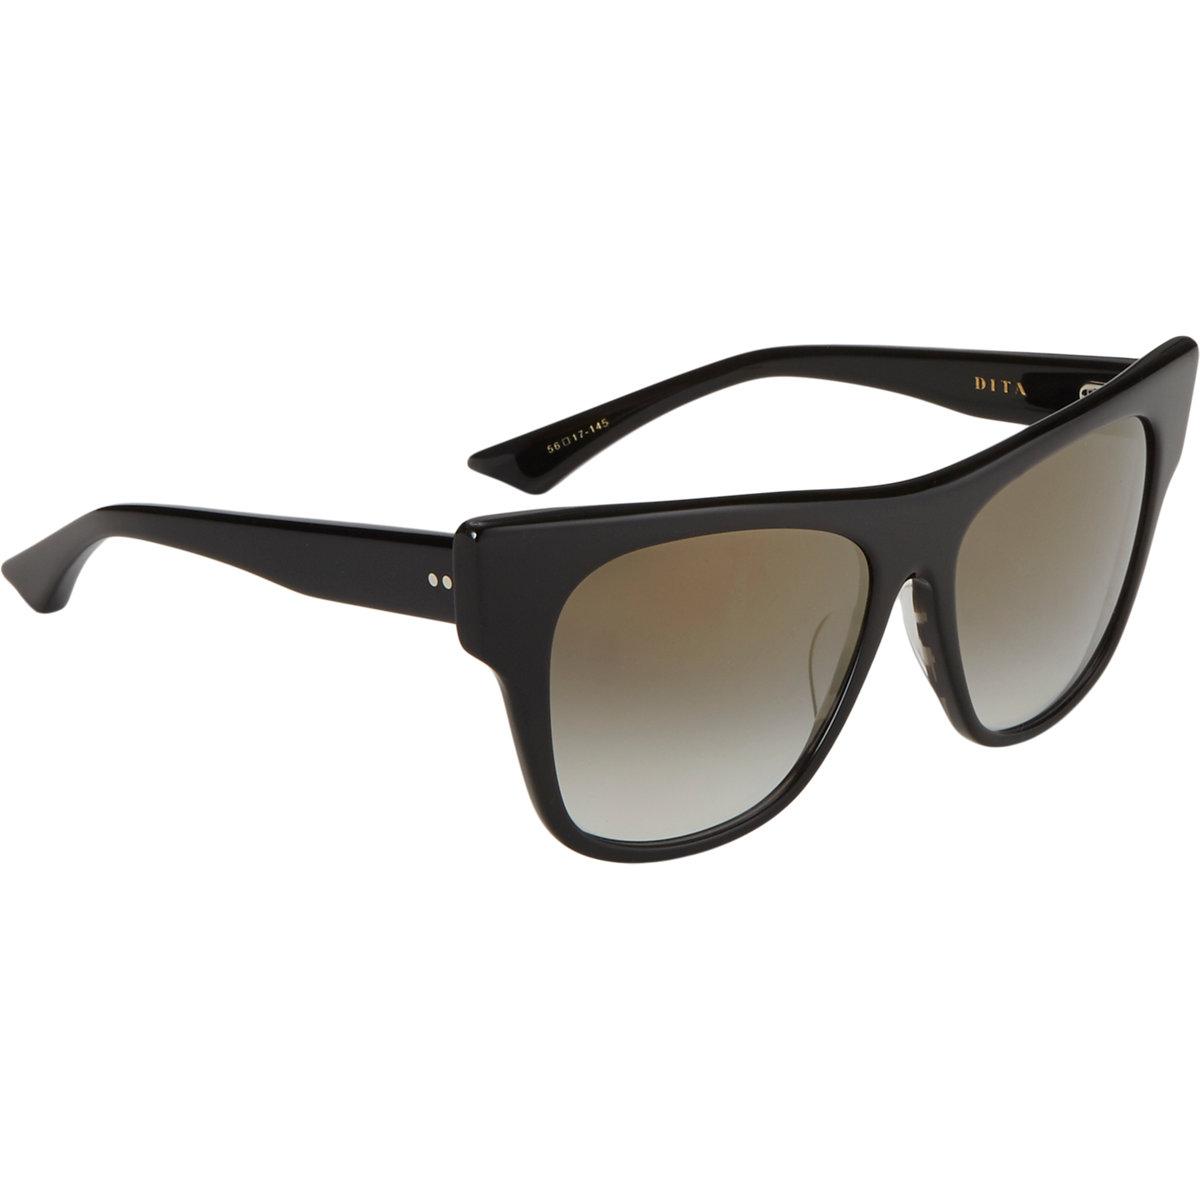 a2fedb3aed Dita Arrifana Sunglasses in Black